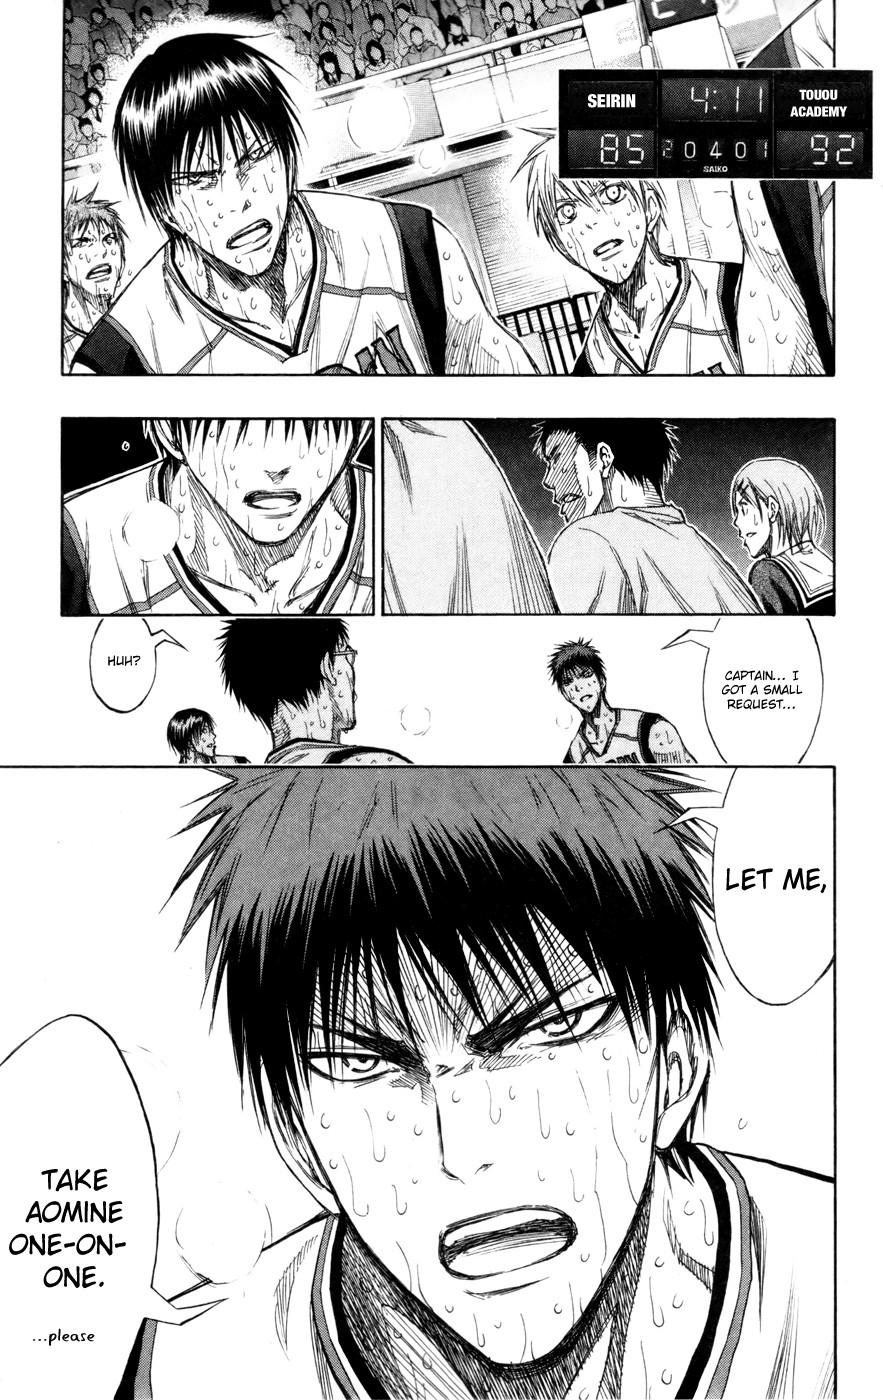 Kuroko no Basket Manga Chapter 134 - Image 19